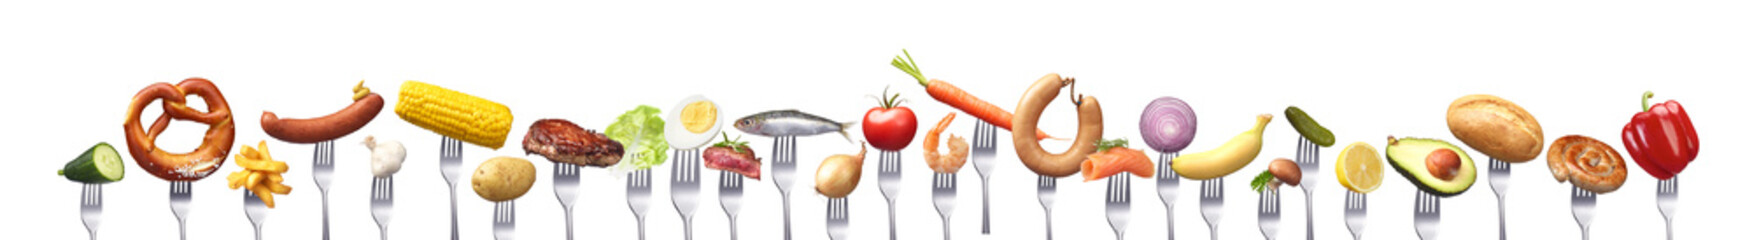 Gruppe verschiedener Lebensmitteln